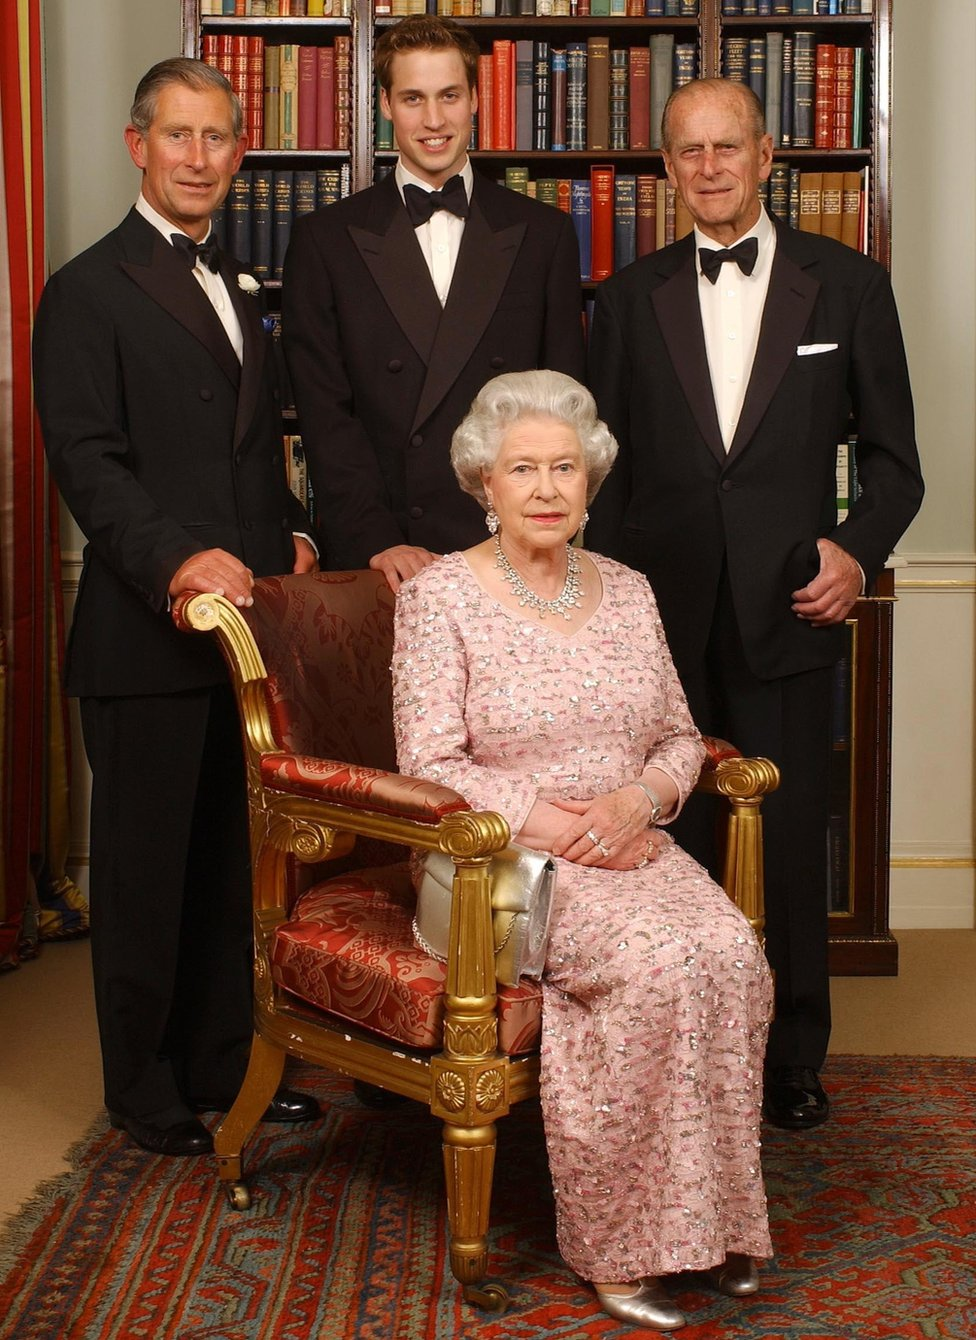 Elizabeta Druga sa suprugom Vojvodom od Edinburga, najstarijim sinom princom od Velsa i njegovim starijim sinom Vilijamom